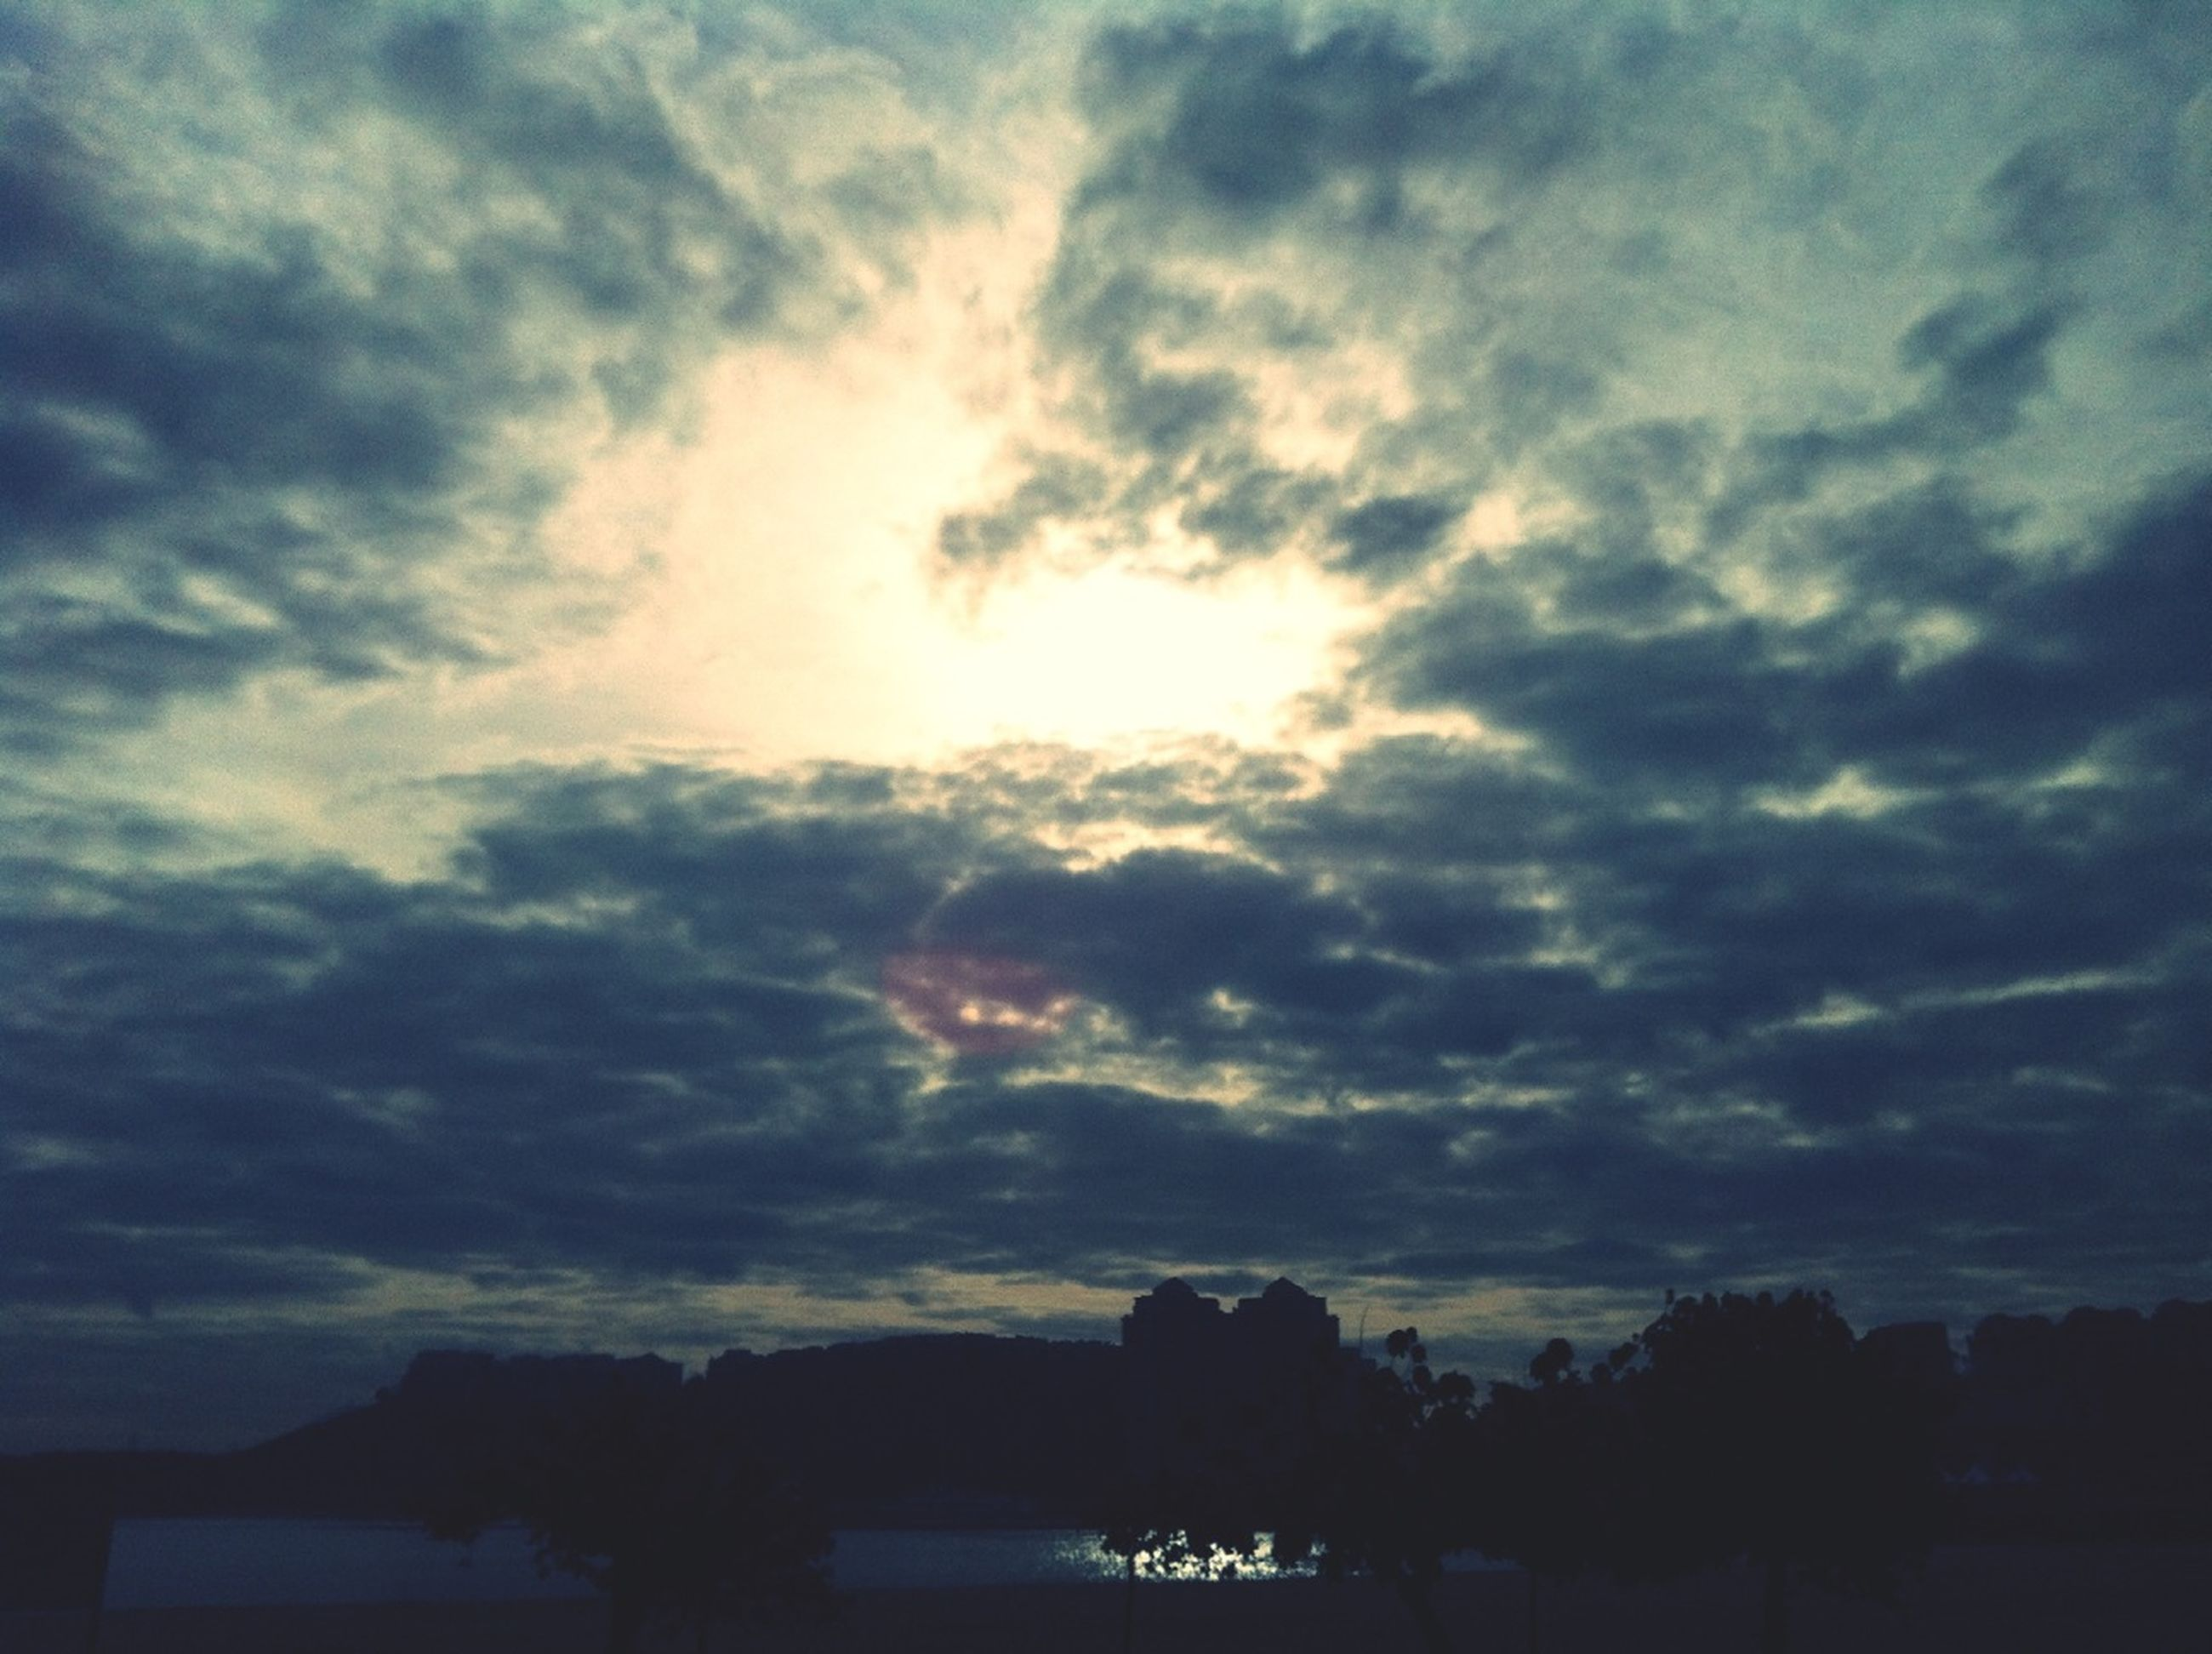 silhouette, sky, cloud - sky, tranquil scene, scenics, beauty in nature, tranquility, sunset, cloudy, nature, cloud, idyllic, sun, tree, sunbeam, weather, sunlight, dramatic sky, outdoors, cloudscape